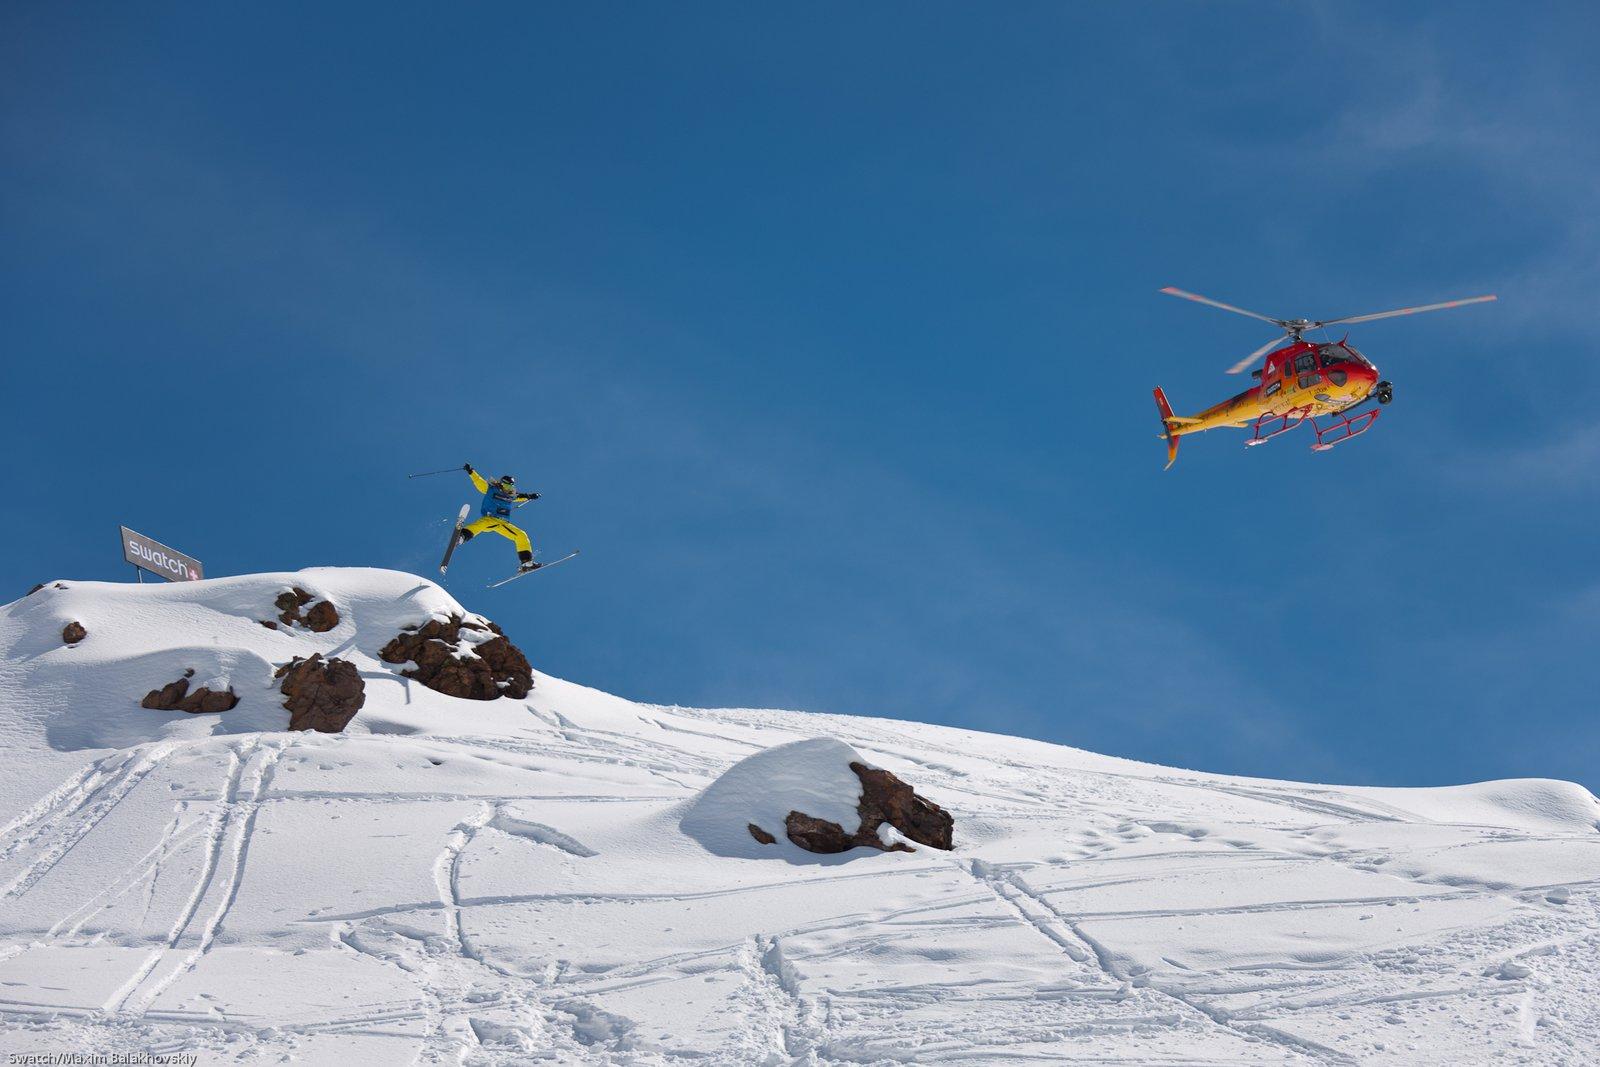 Kaj Zackrisson at the Swatch Skiers Cup